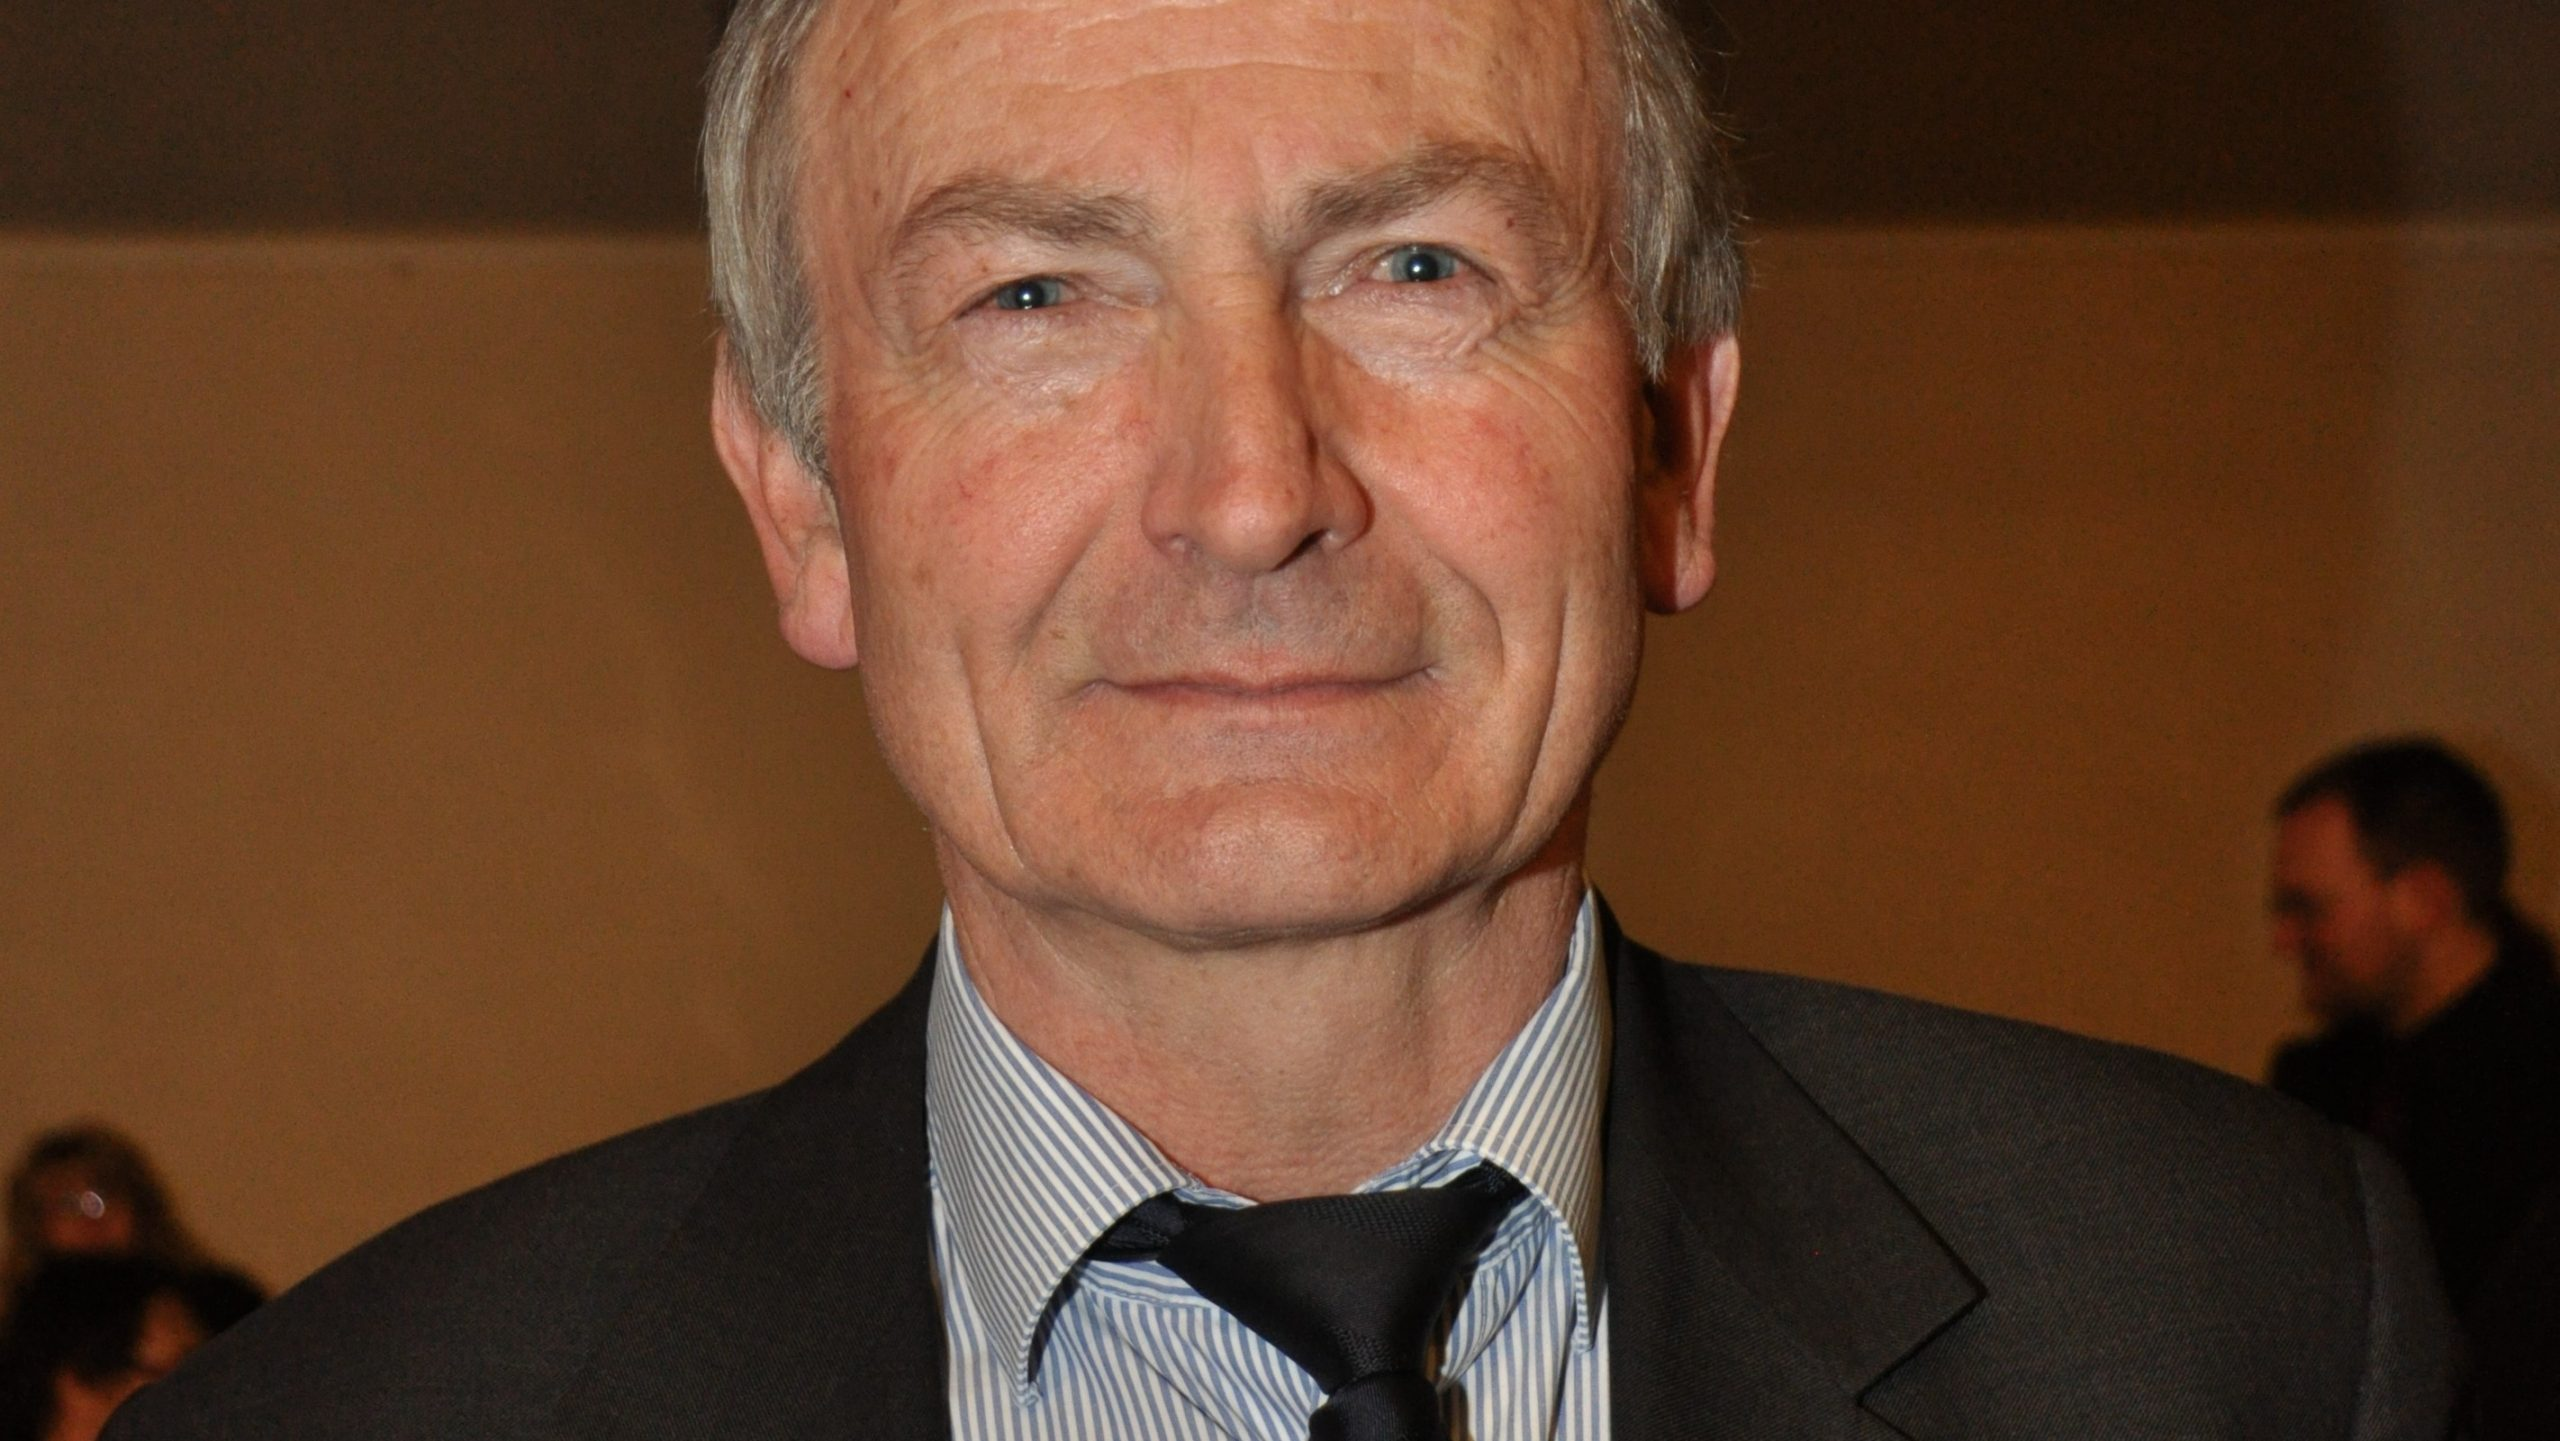 Manfred_Pohl-Portrait